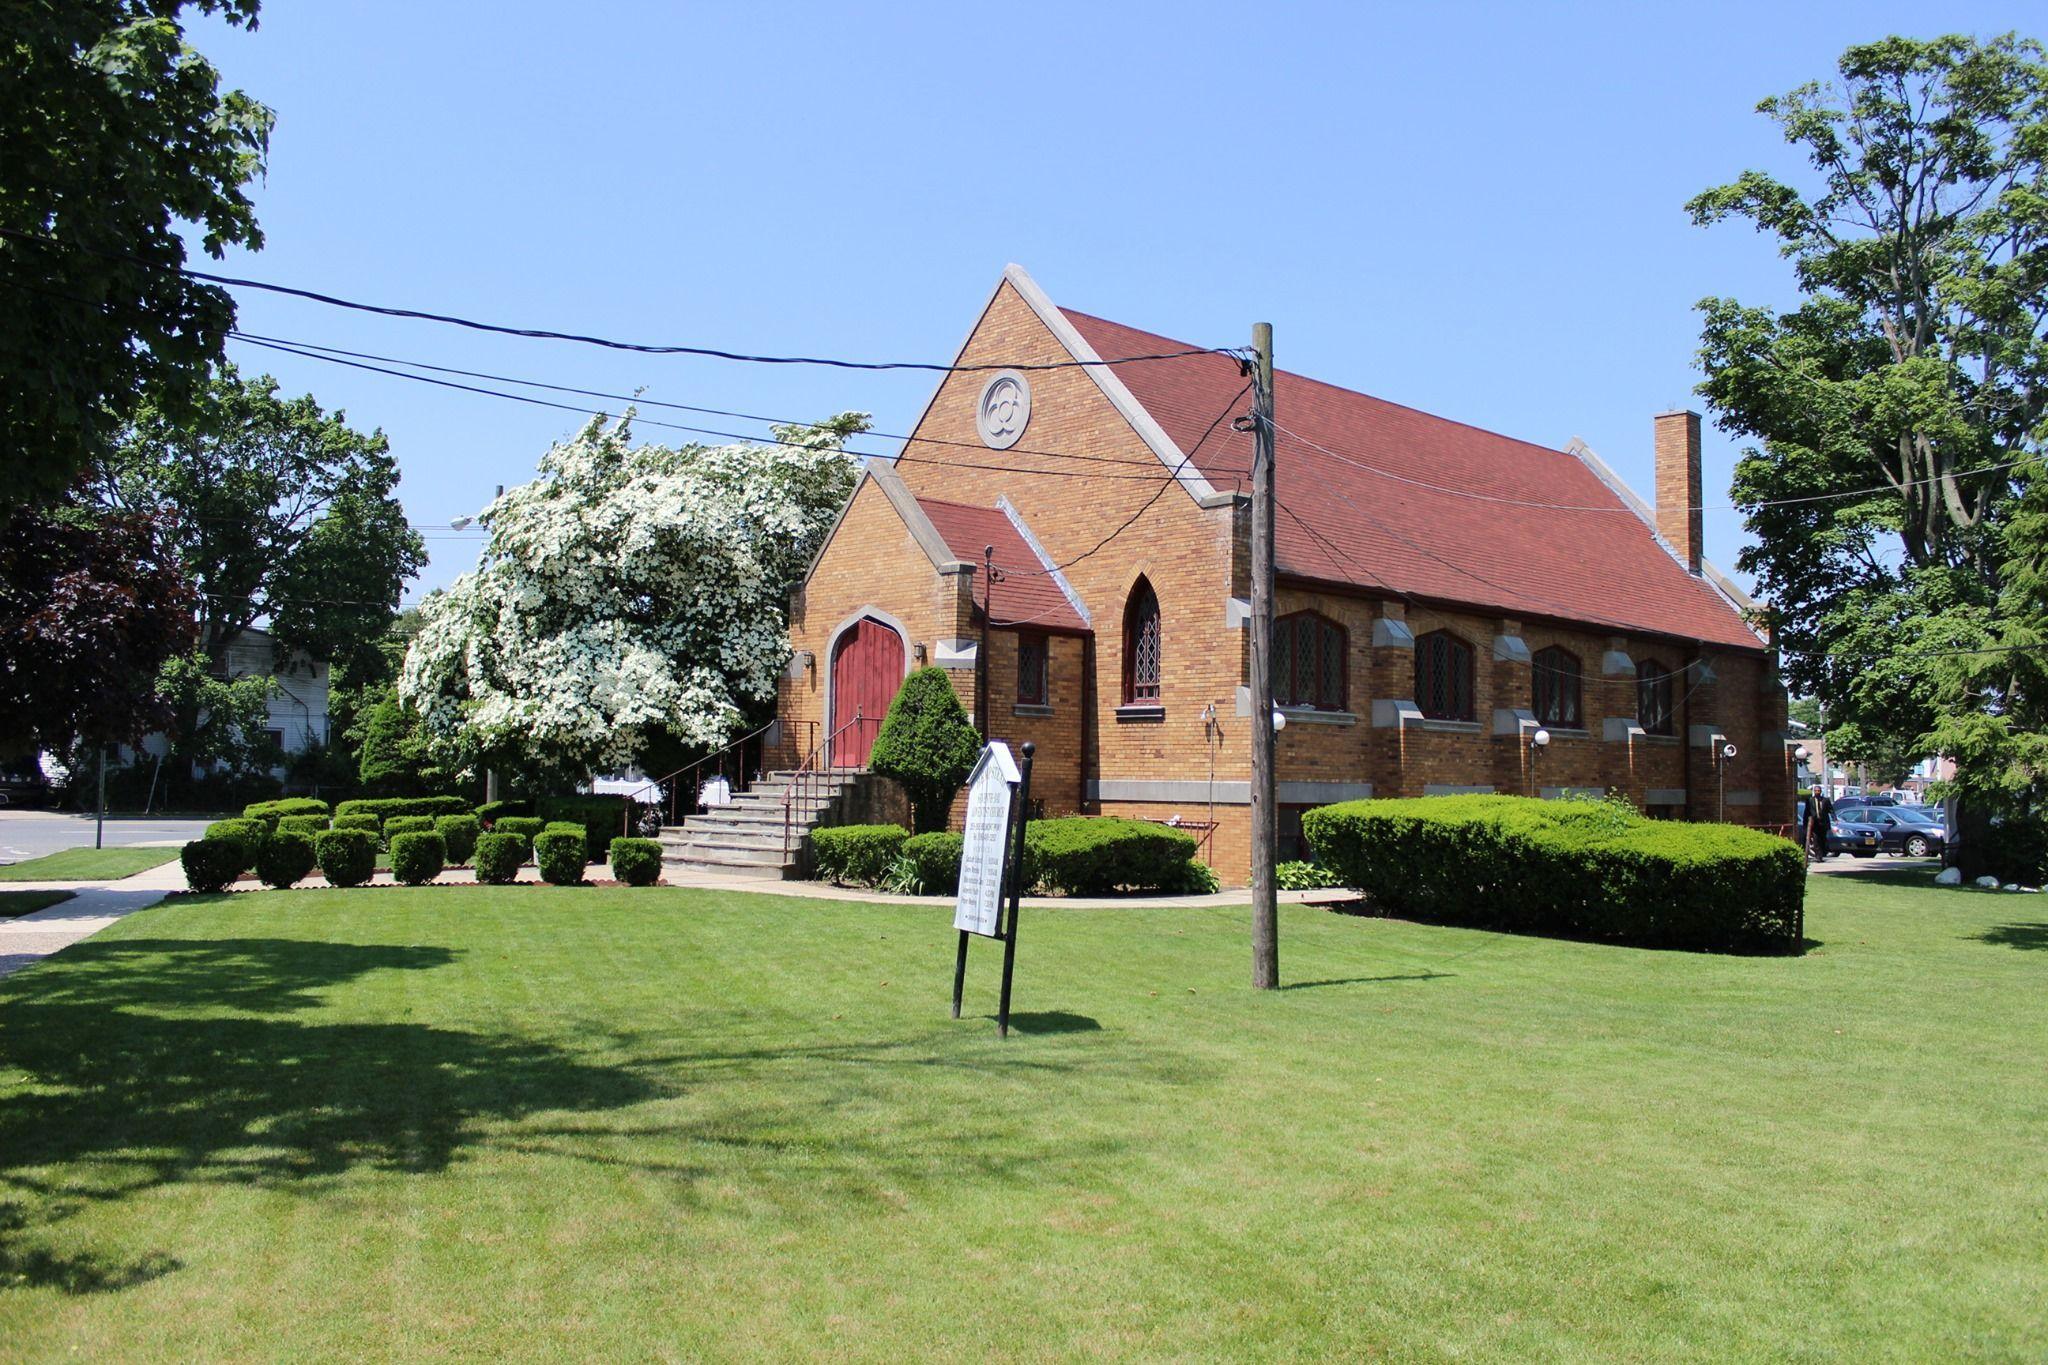 Community Service Dept (7th Day Adventist)